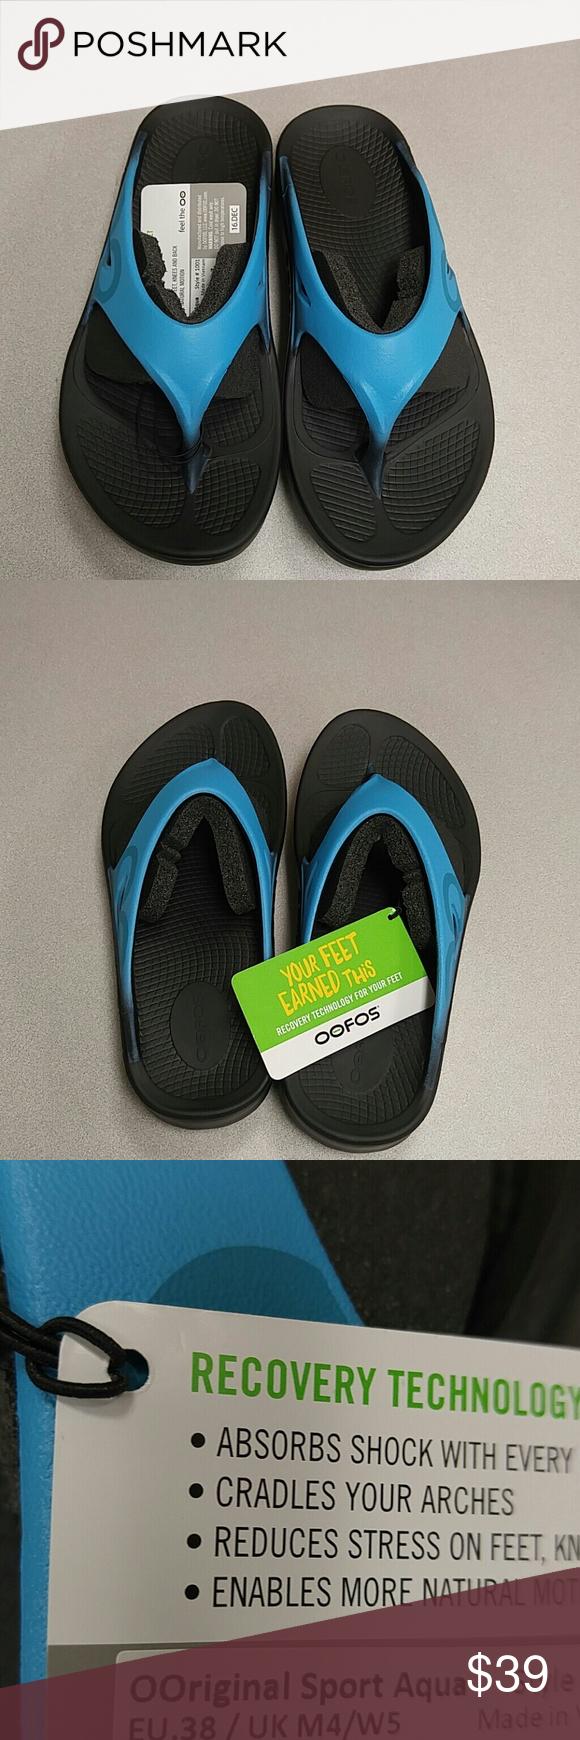 Oofos Unisex Original Sport Sandal Sport Sandals Sandals Flip Flop Sandals